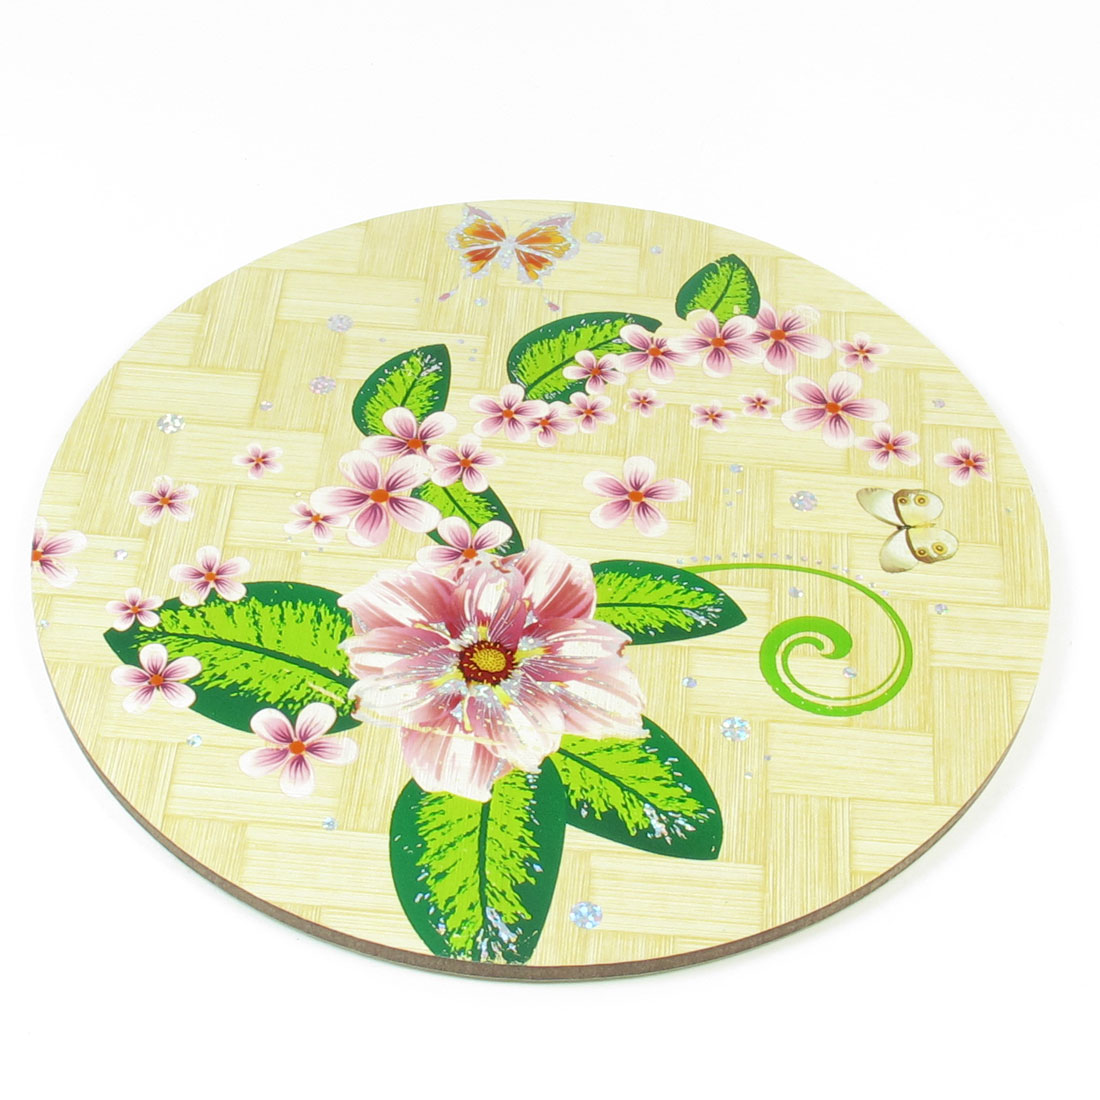 Home Tea House Round Design Beige Green Pink Flower Print Wood Cup Pot Mat Coaster Pad